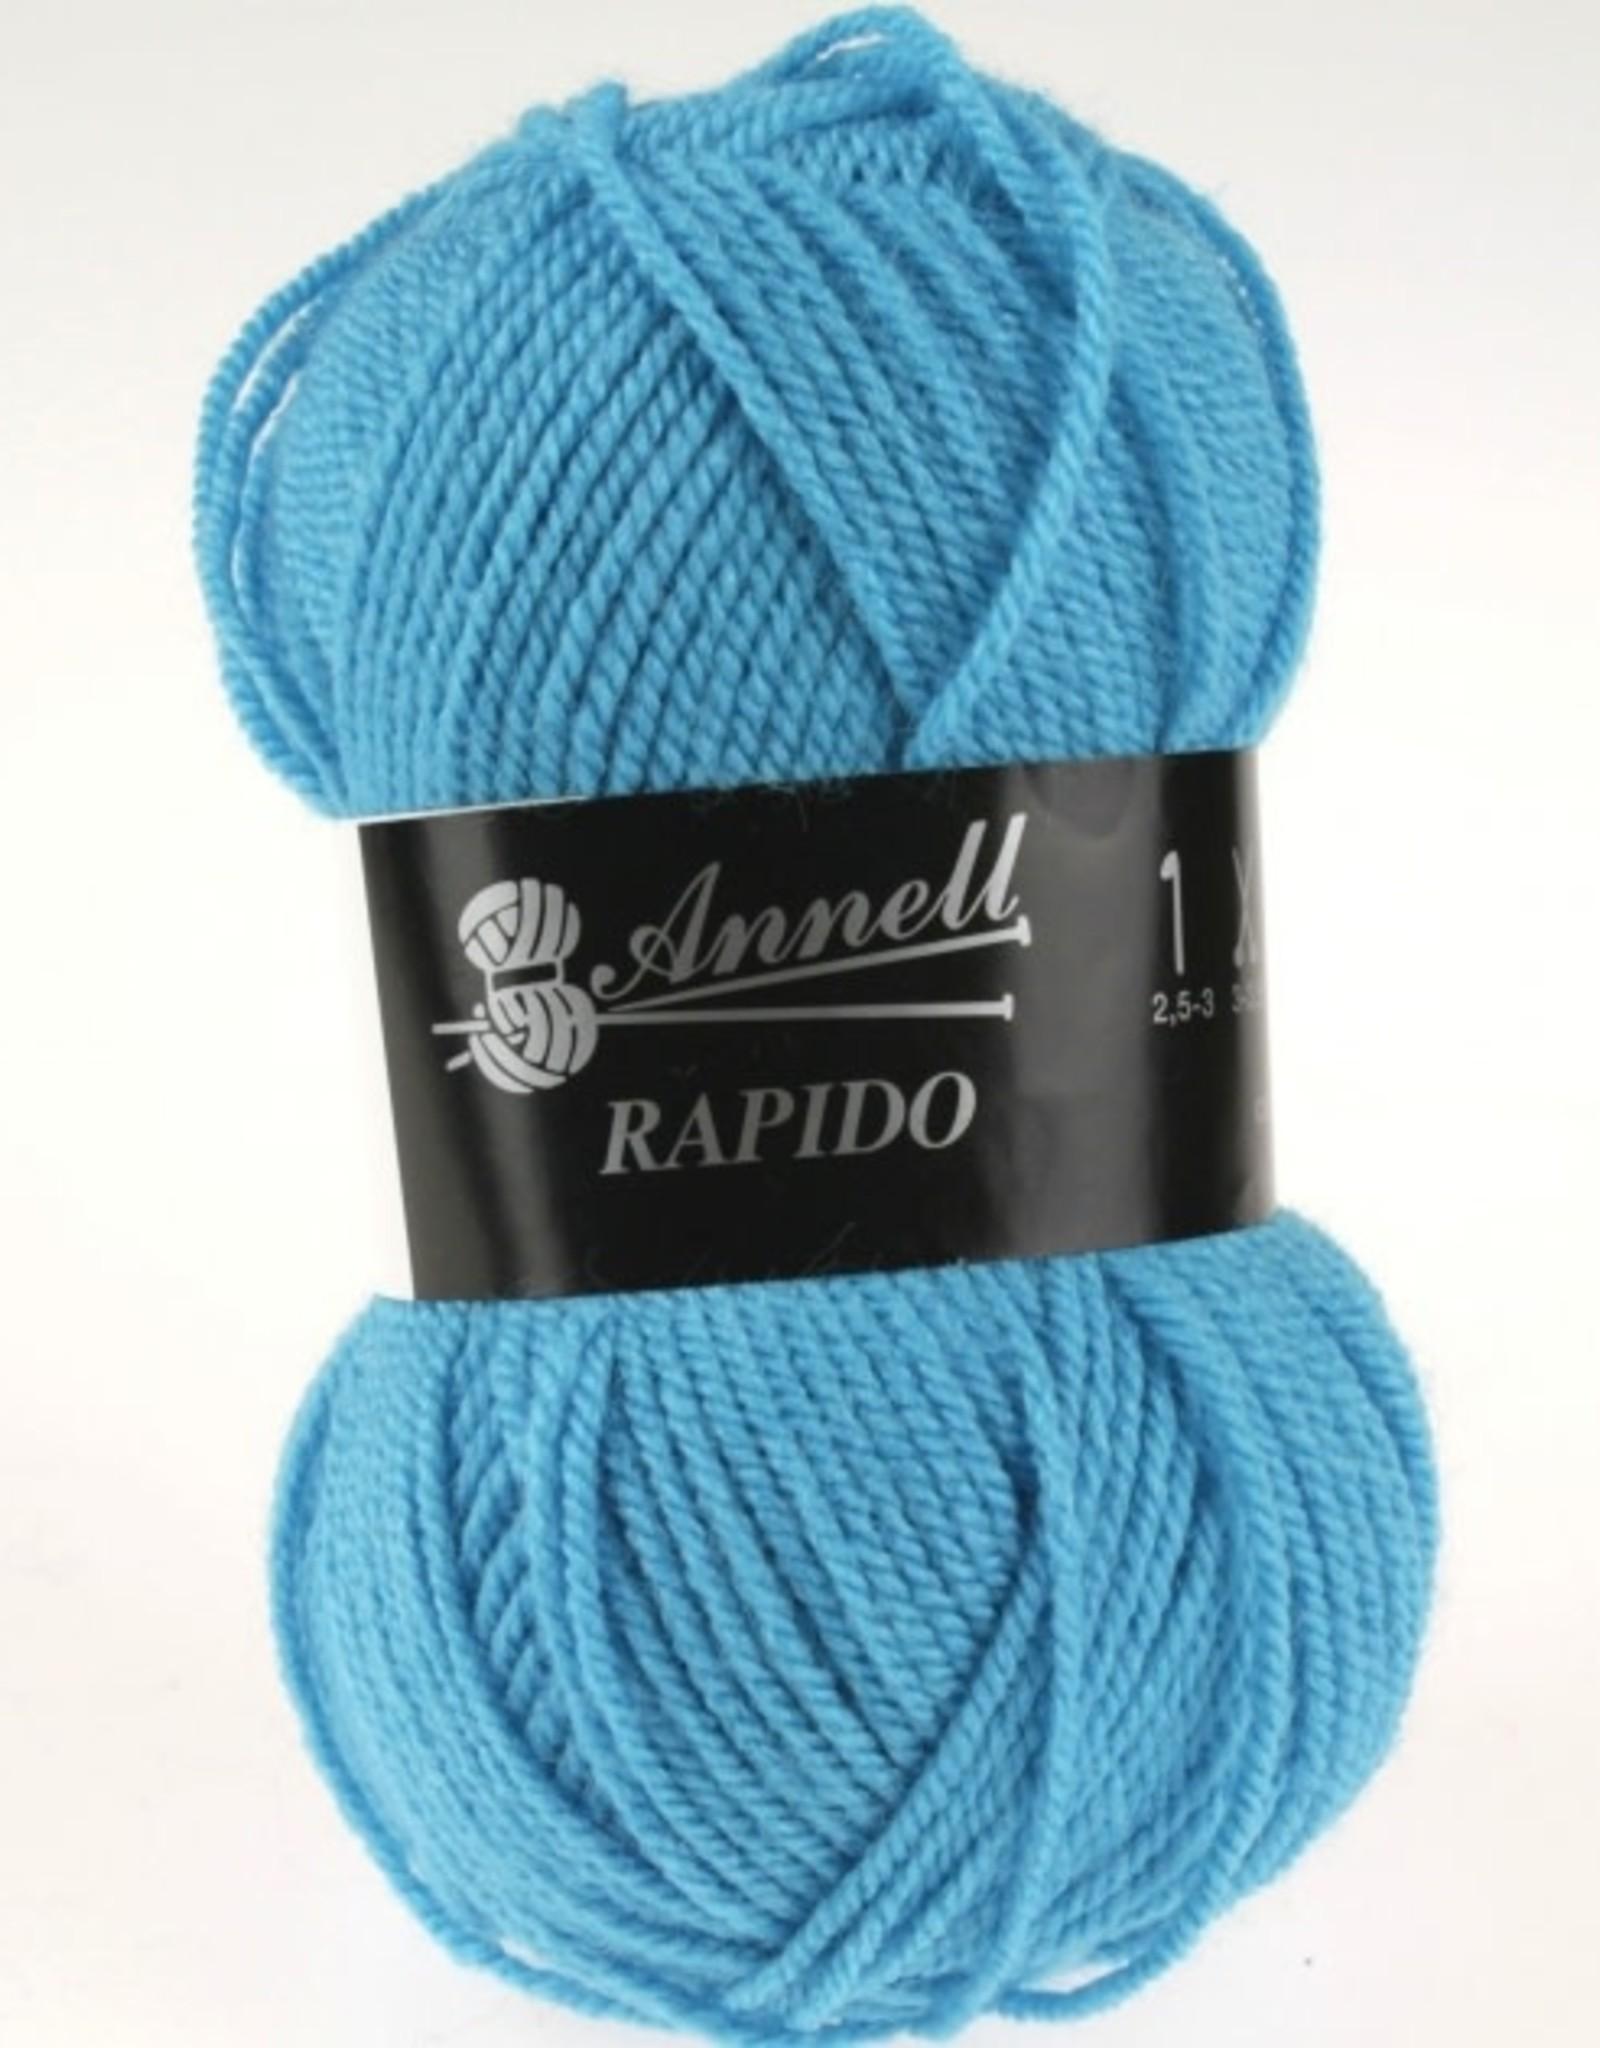 Annell Annell rapido 3241